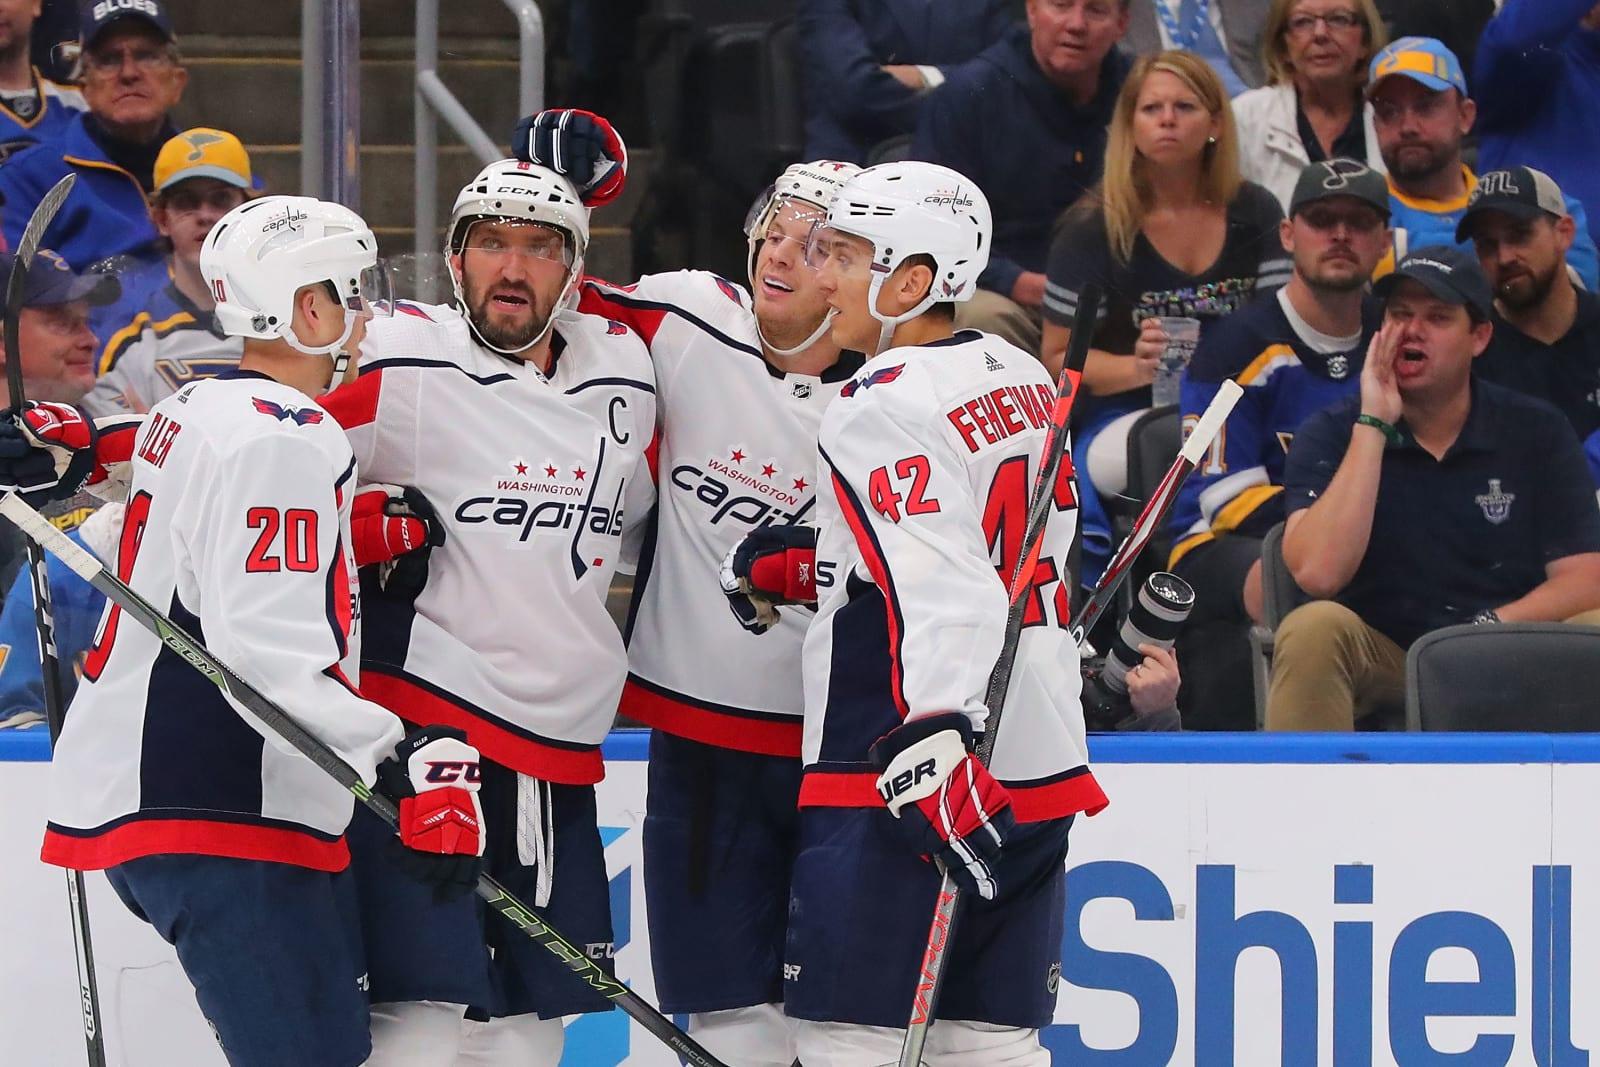 Fehervary celebrates a Alex Ovechkin goal against the St. Louis Blues preseason game